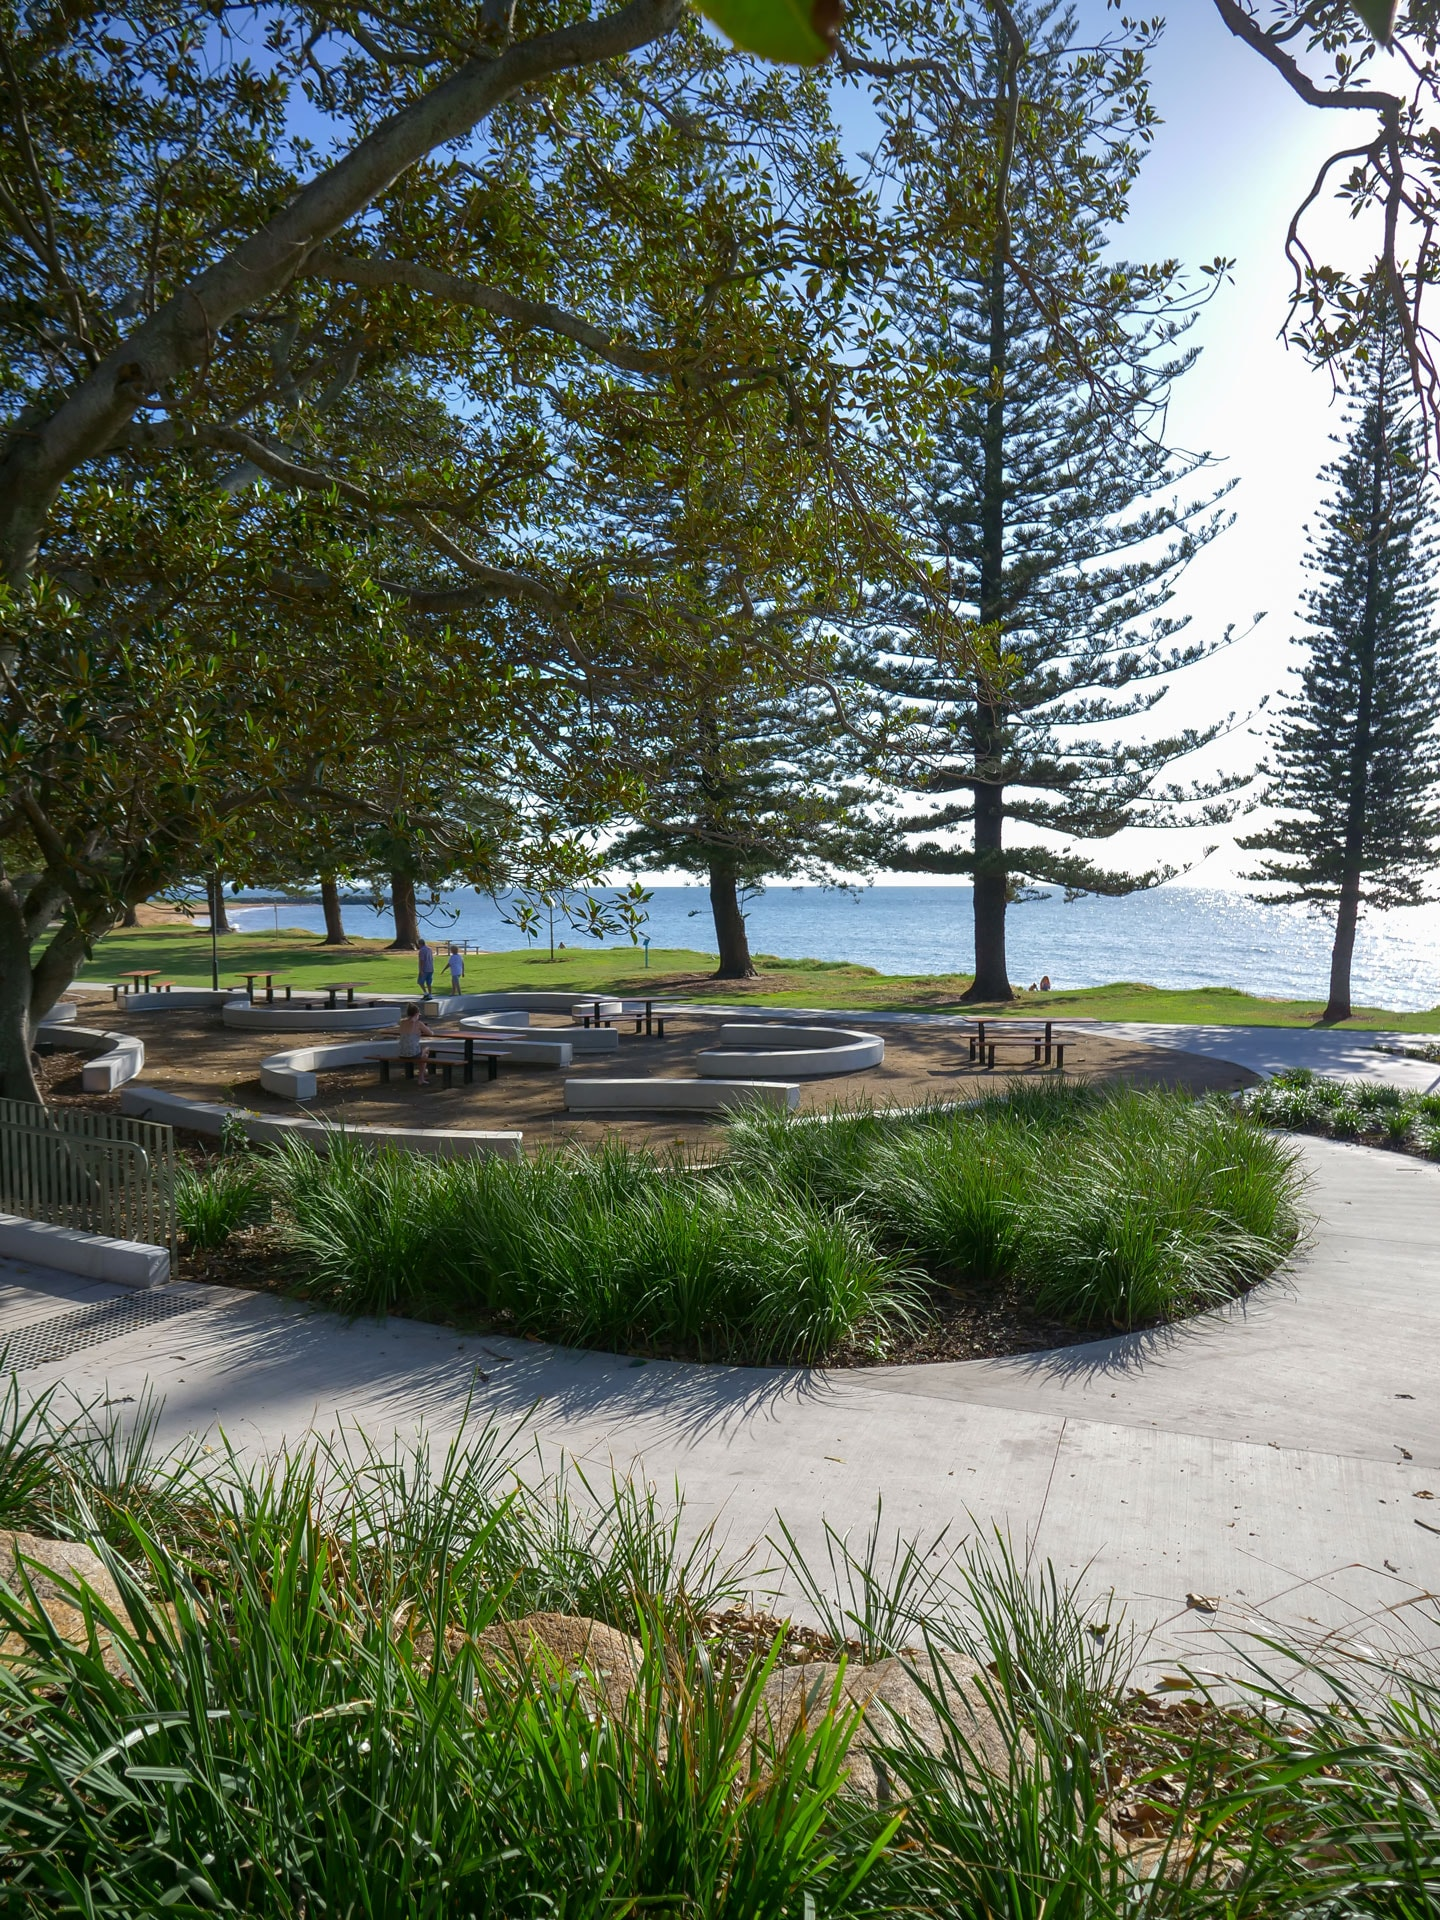 10.-Scarborough-Beach-Park-P1044472.jpg